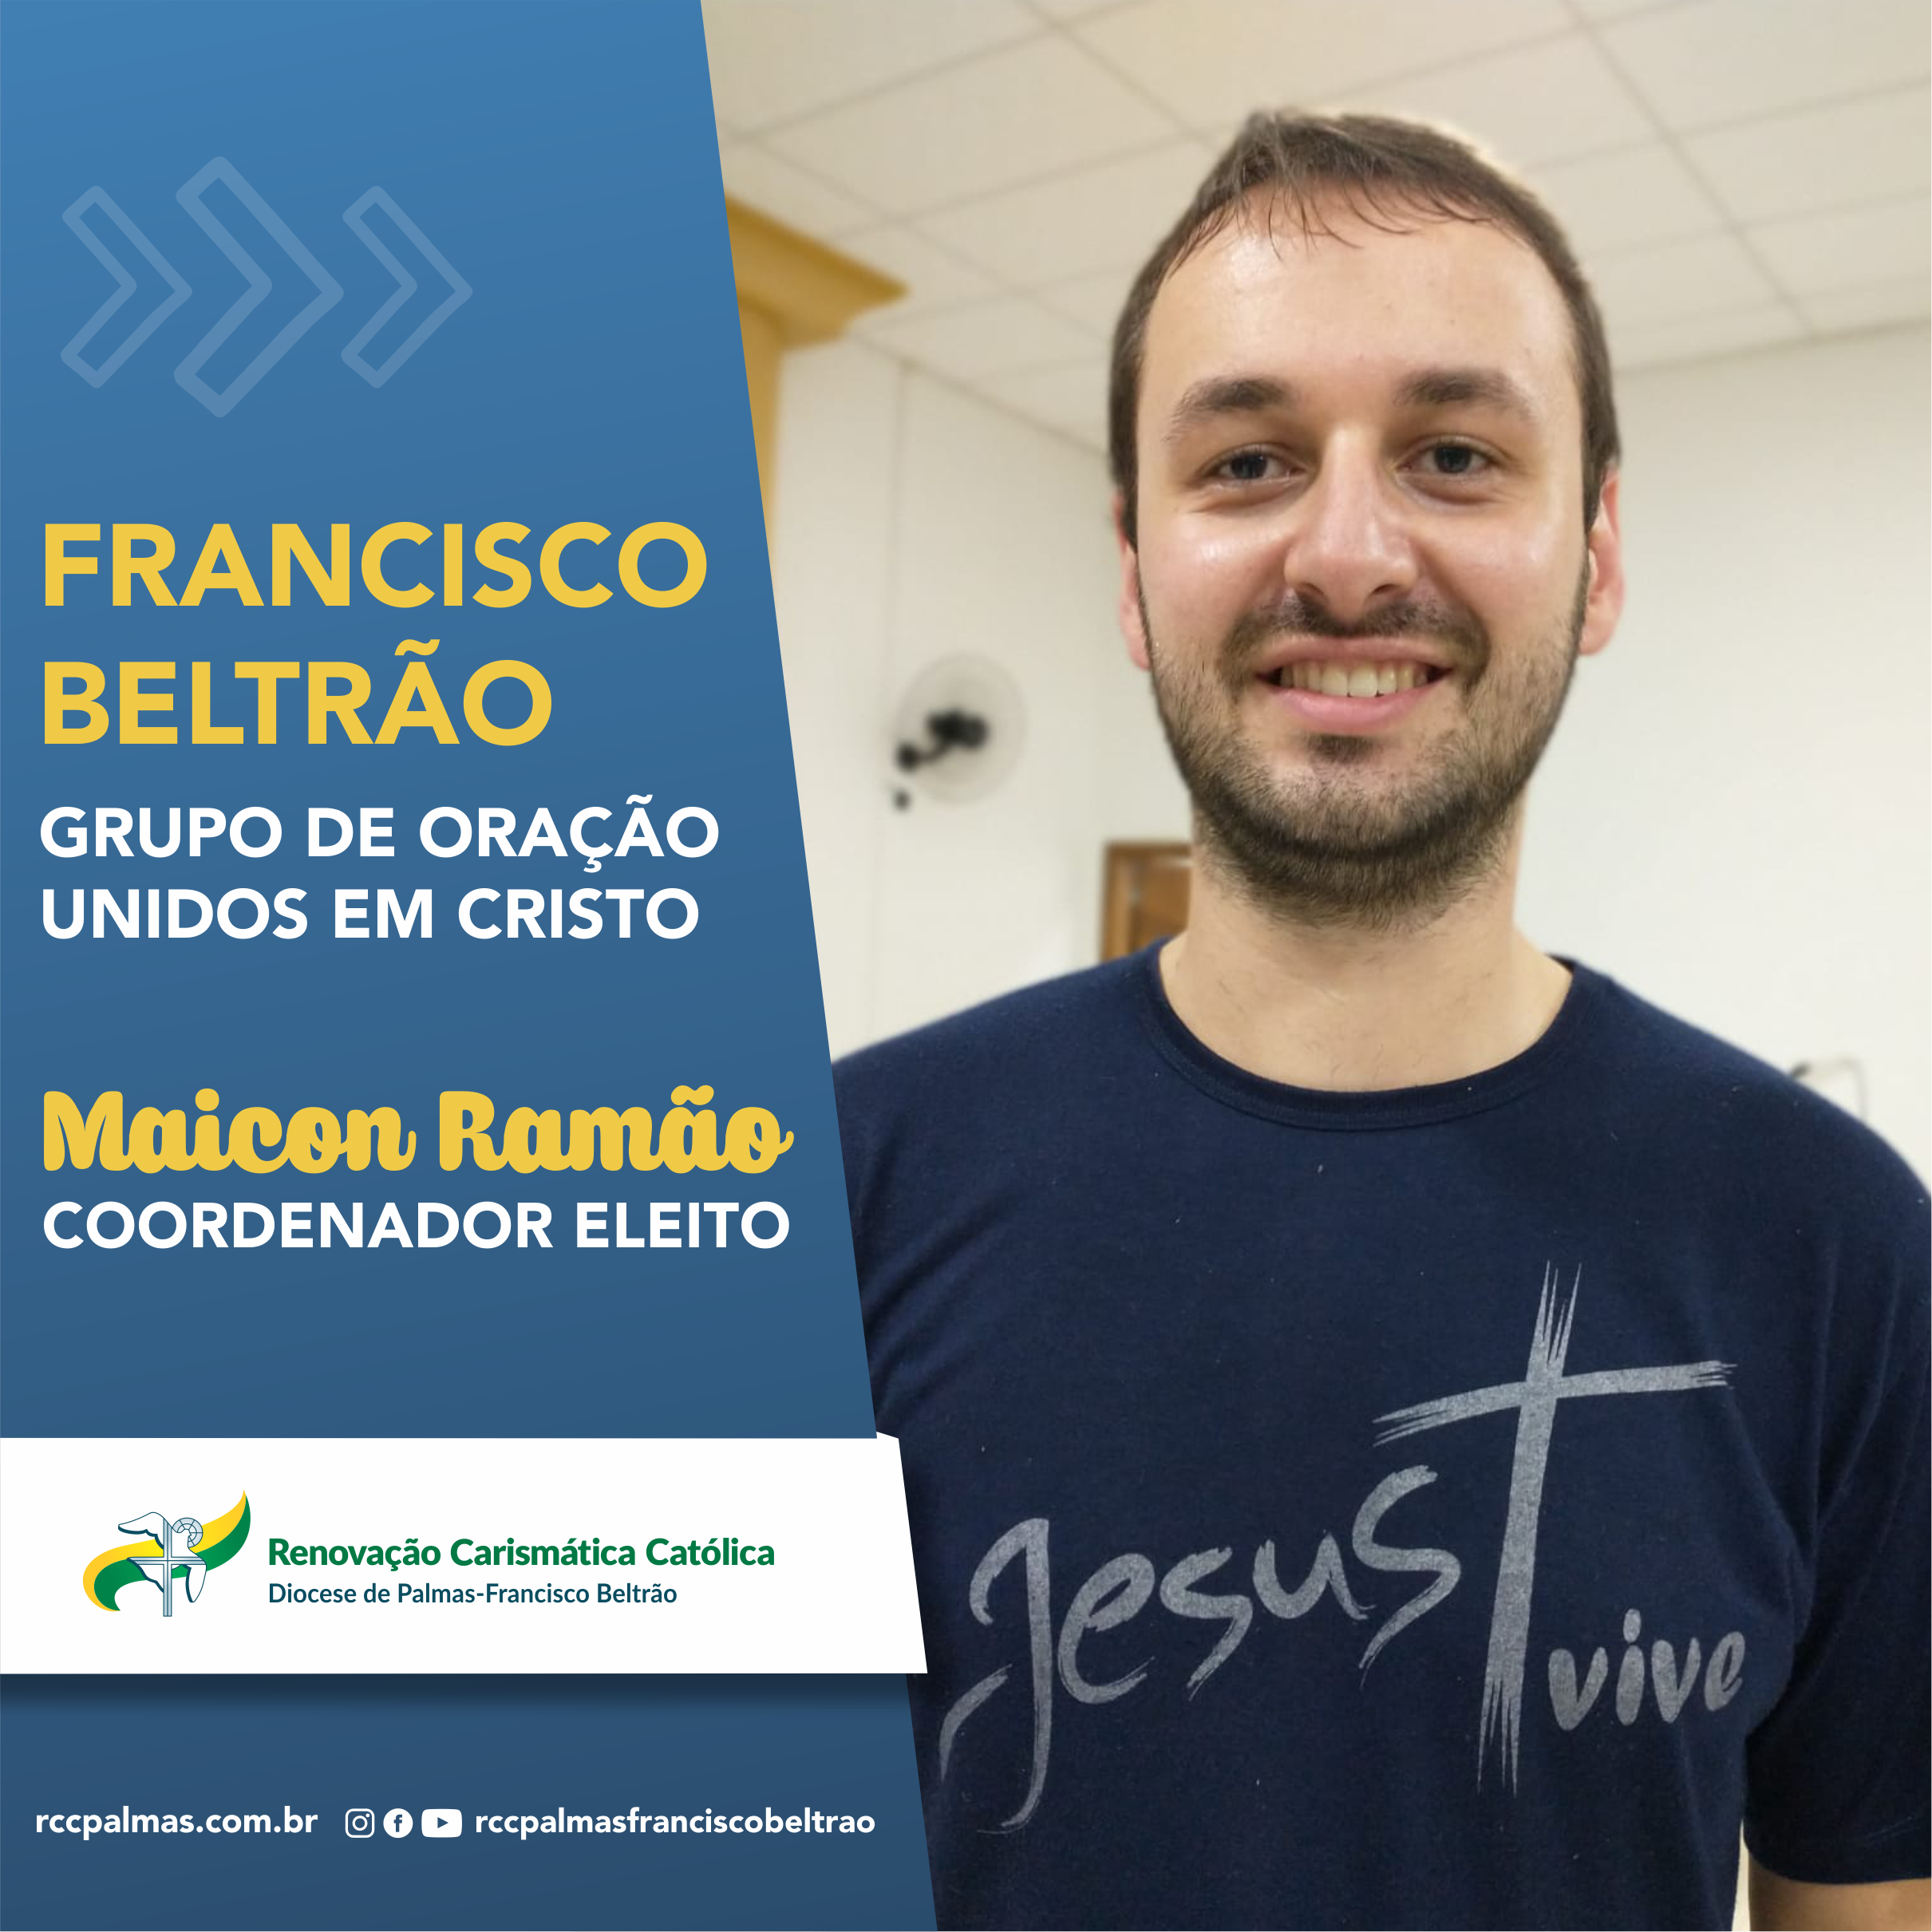 31 francisco beltrao - unidos em cristo